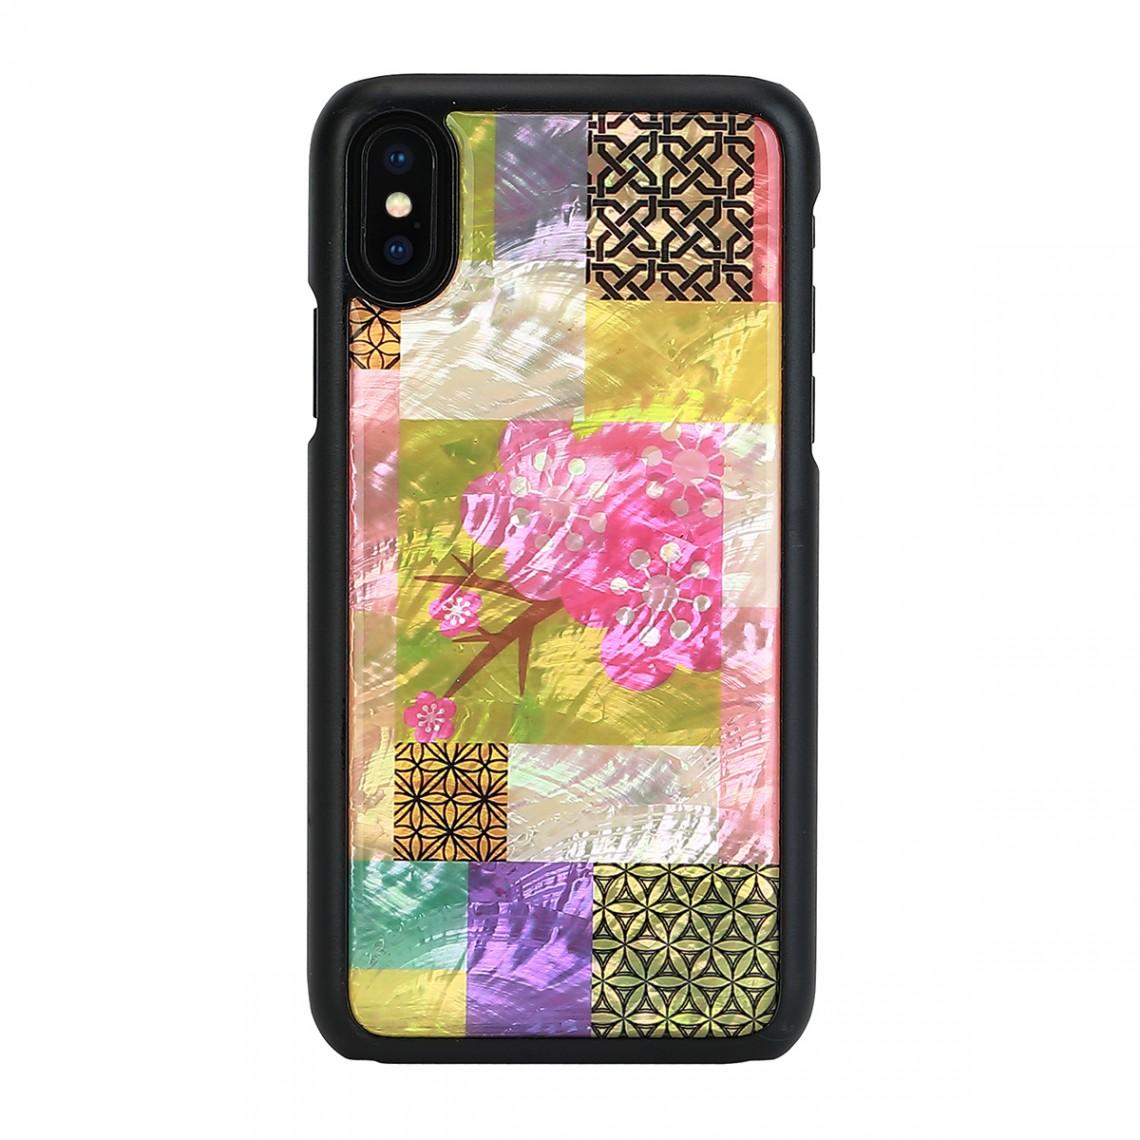 iPhone XS Max 天然貝 ケース ikins Cherry Blossom